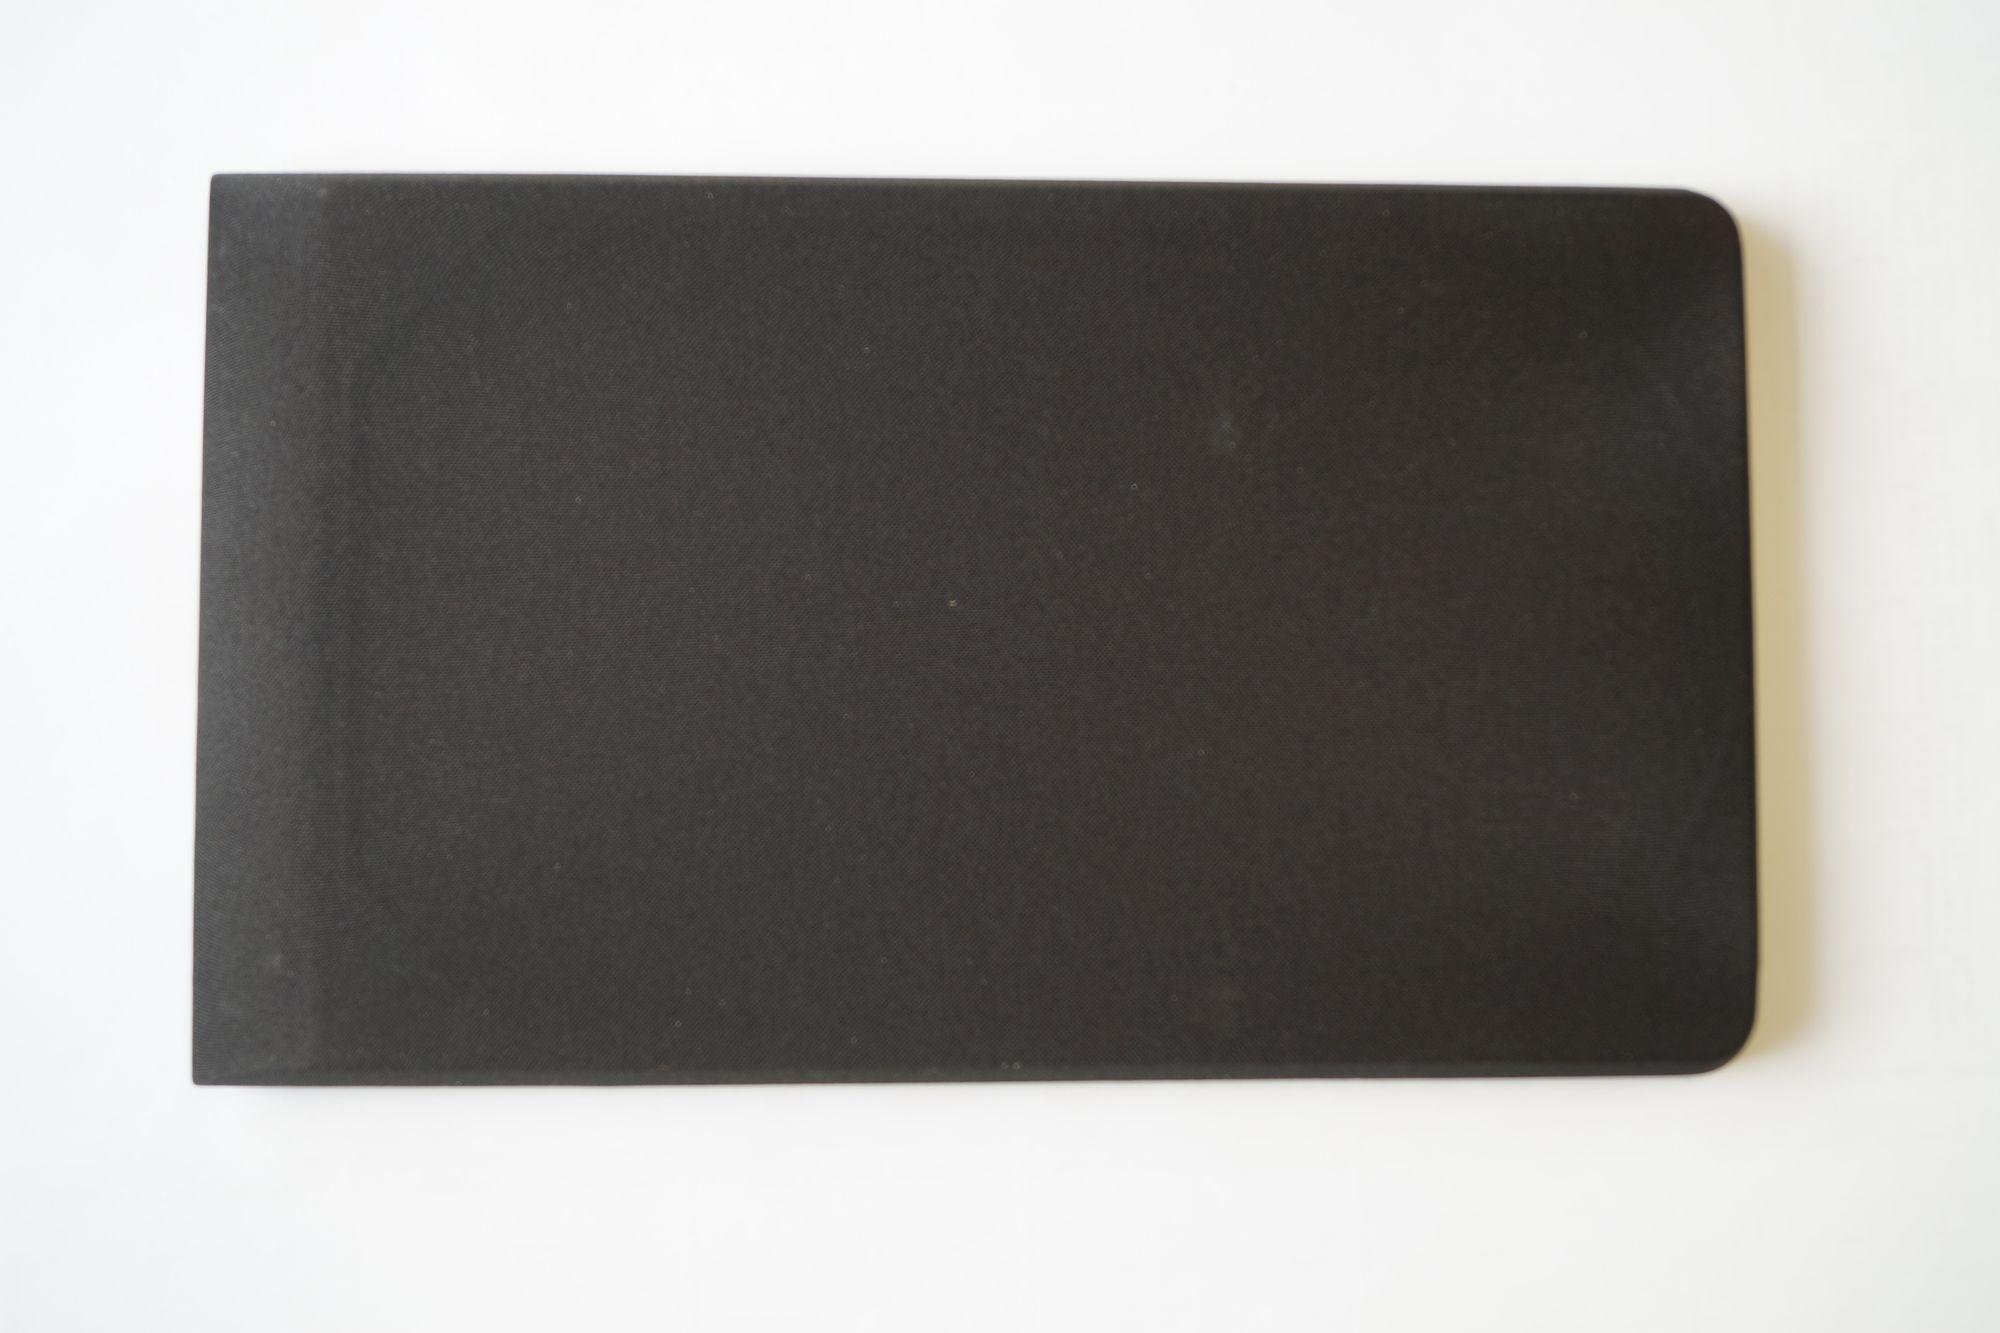 1 Stück Magnat Quantum 903 Lautsprecherabdeckung schwarz Neu 001